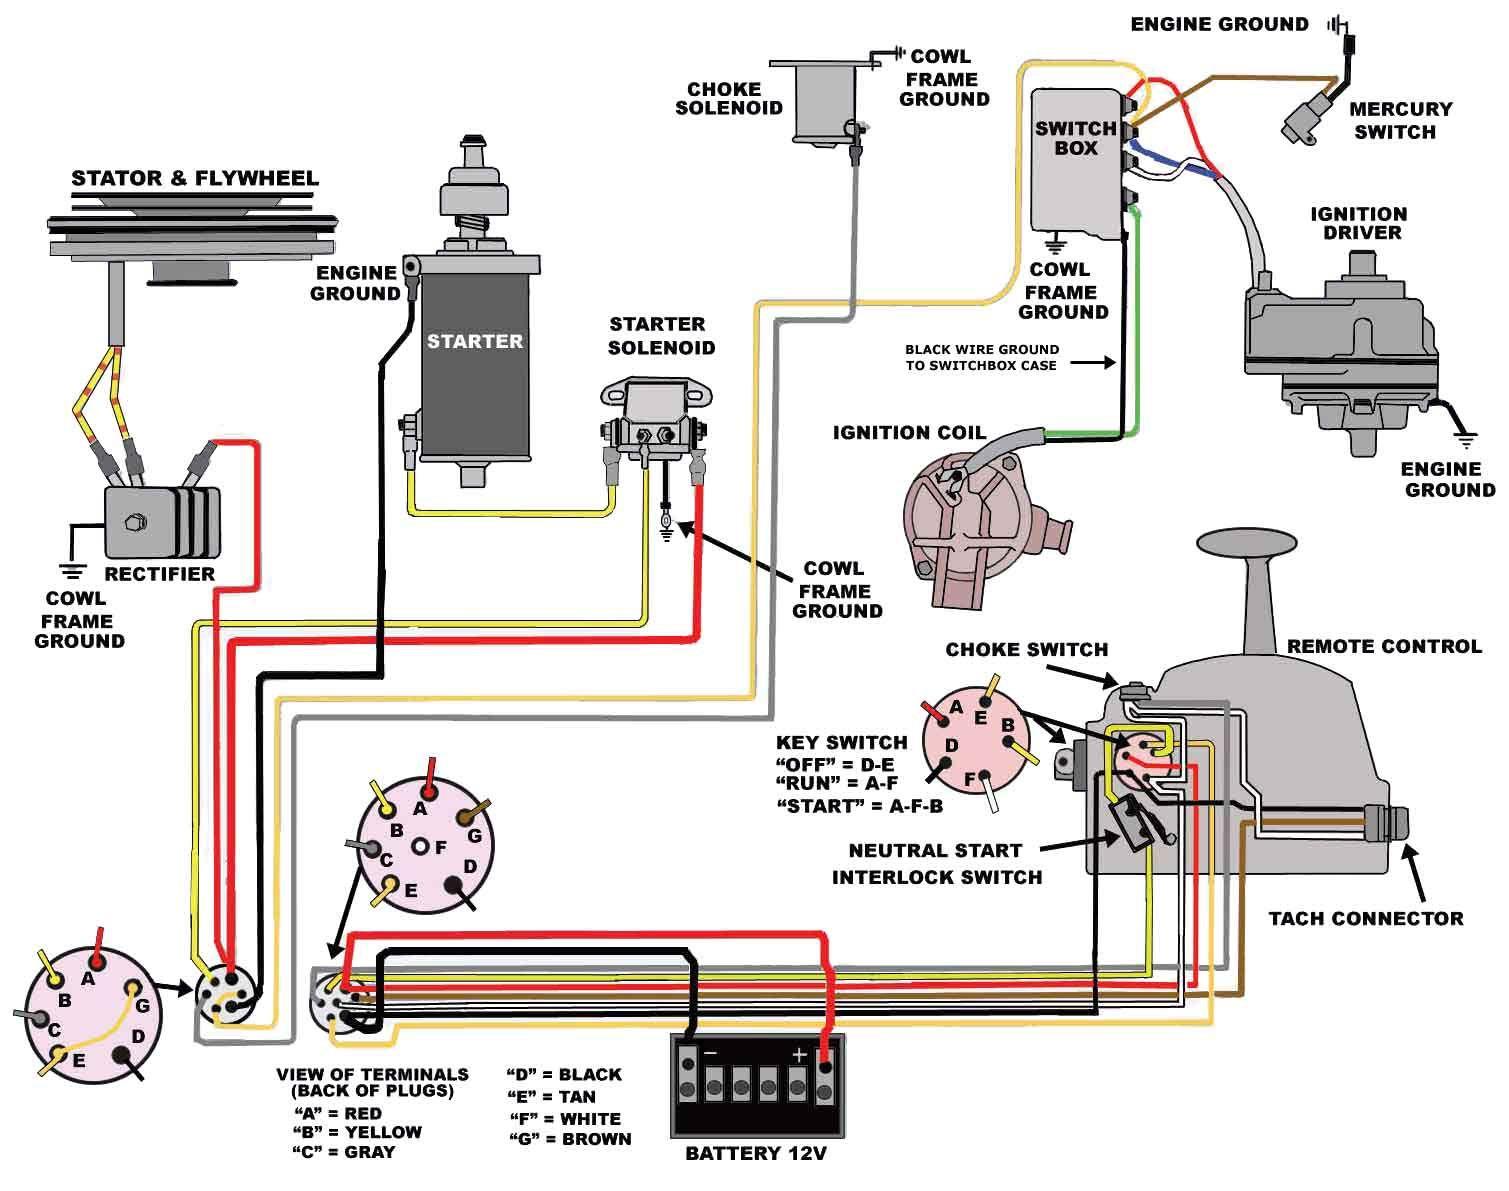 Outboard Motor Wiring Diagram | Manual E-Books - Wiring Diagram For Mercury Outboard Motor